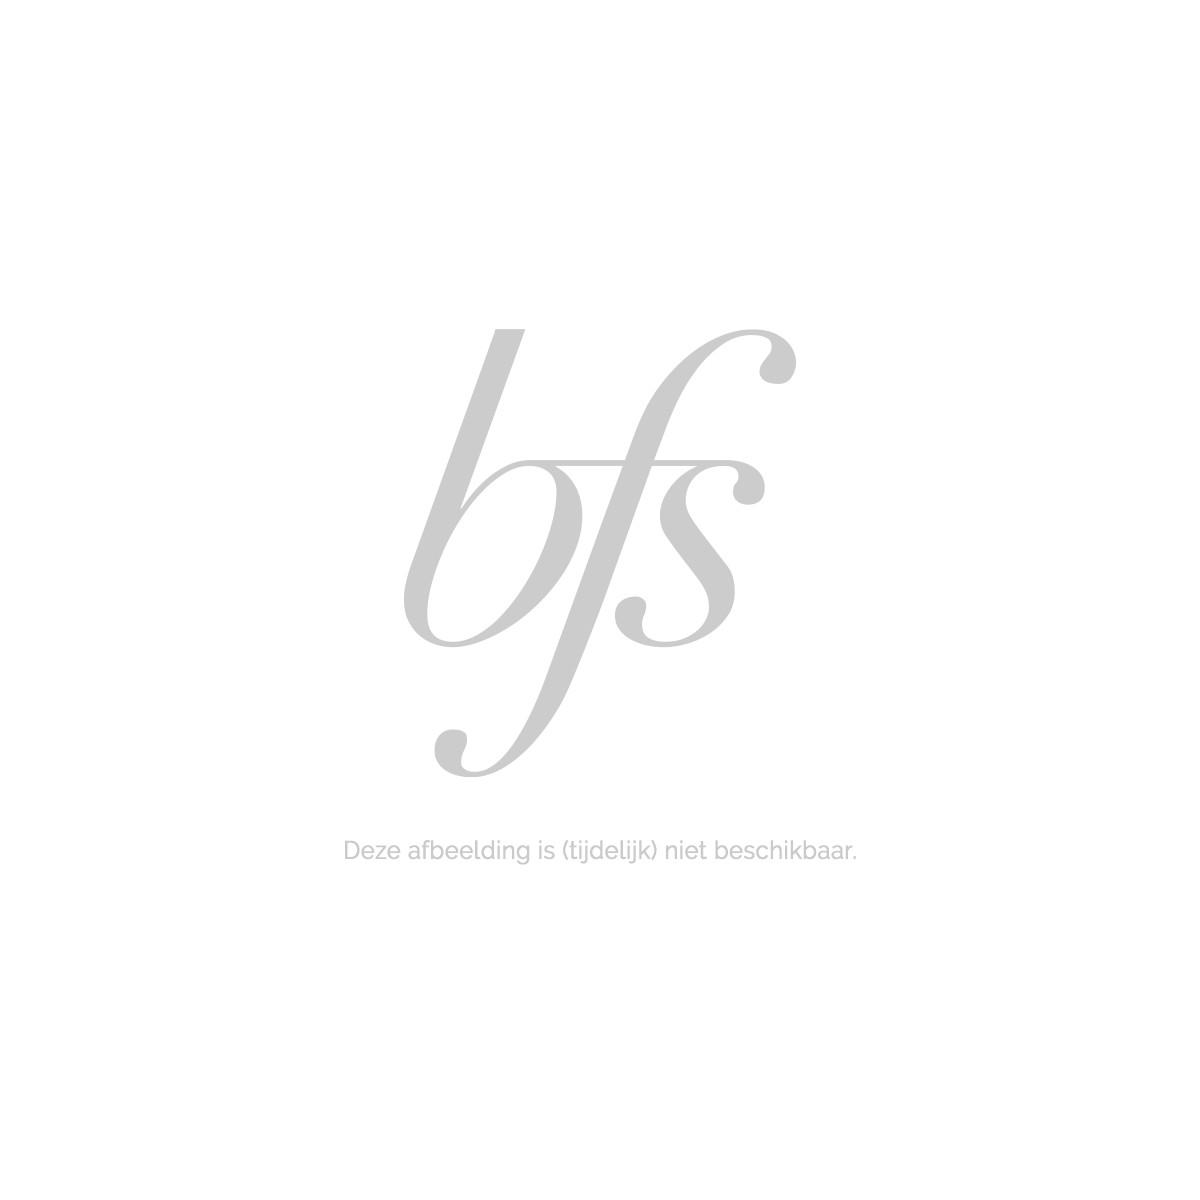 Tonymoly Vital Vita 12 Brigthening Ampoule – Vitamin B12